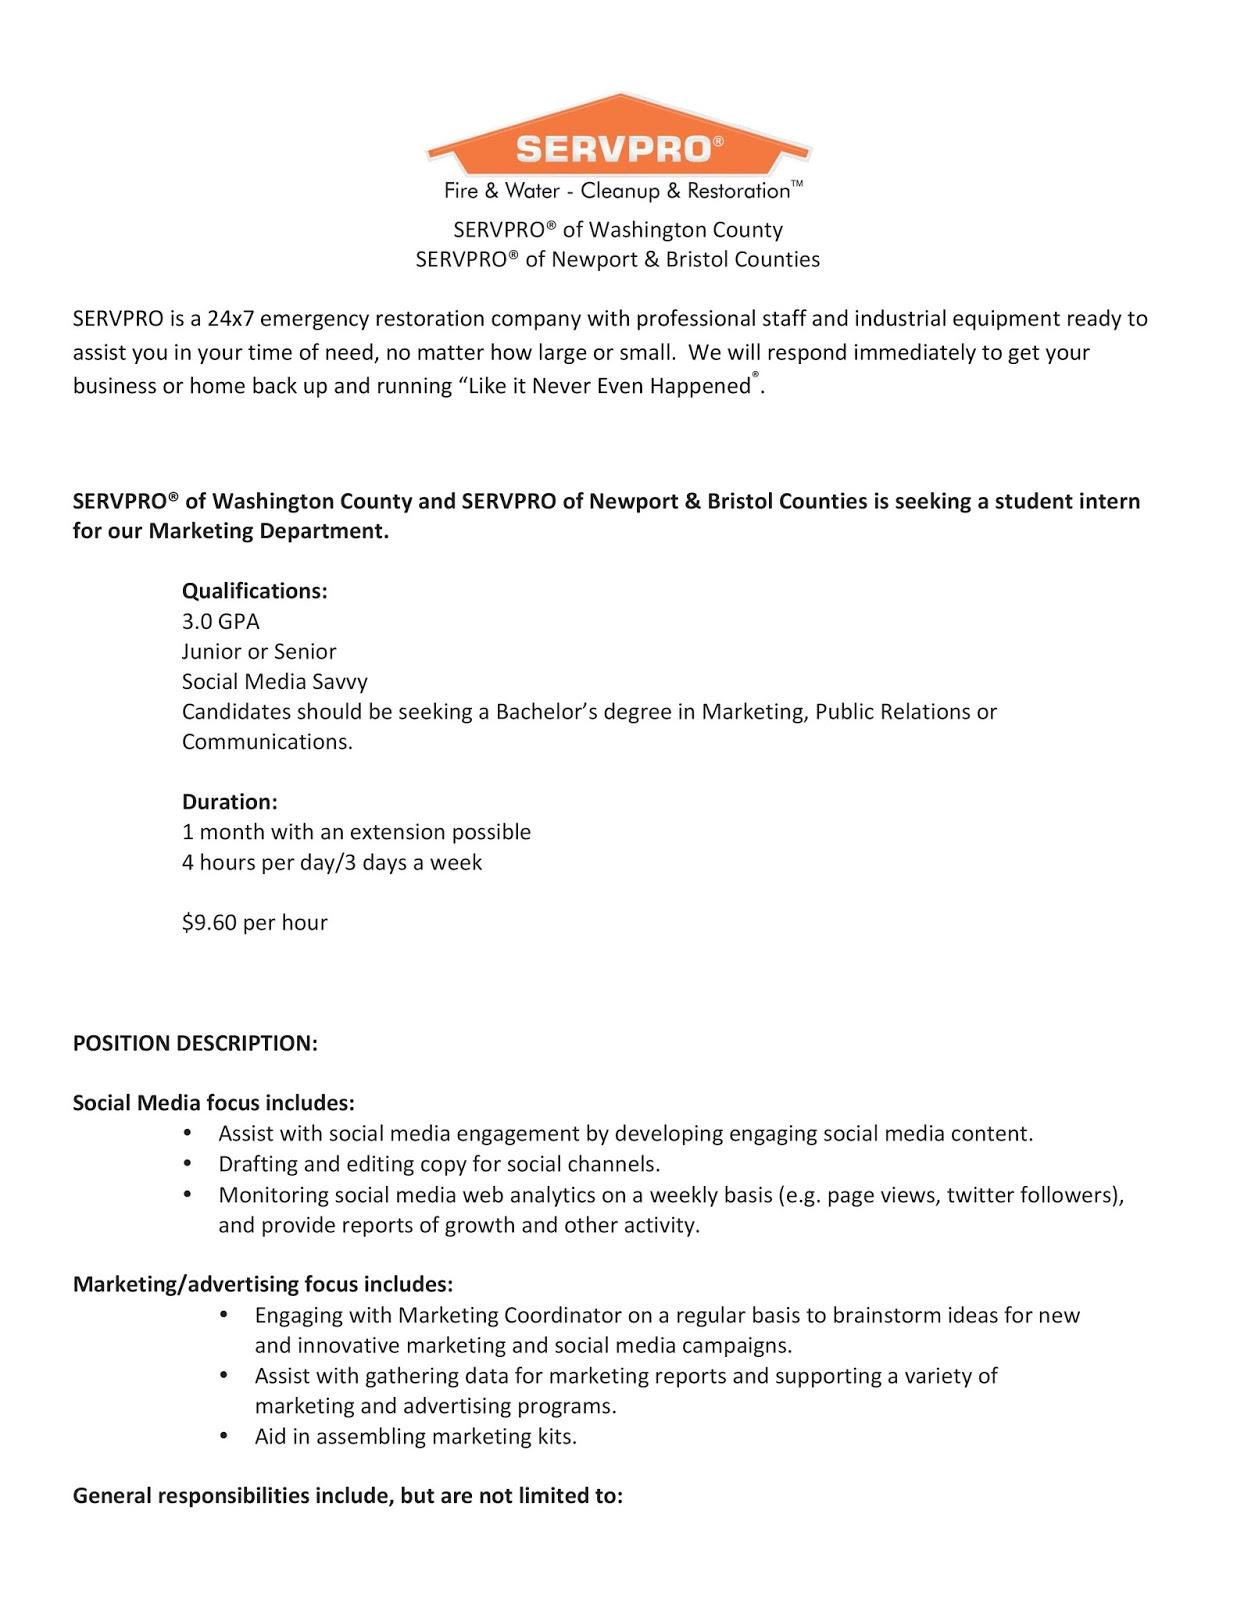 uri cba internship  job information  servpro